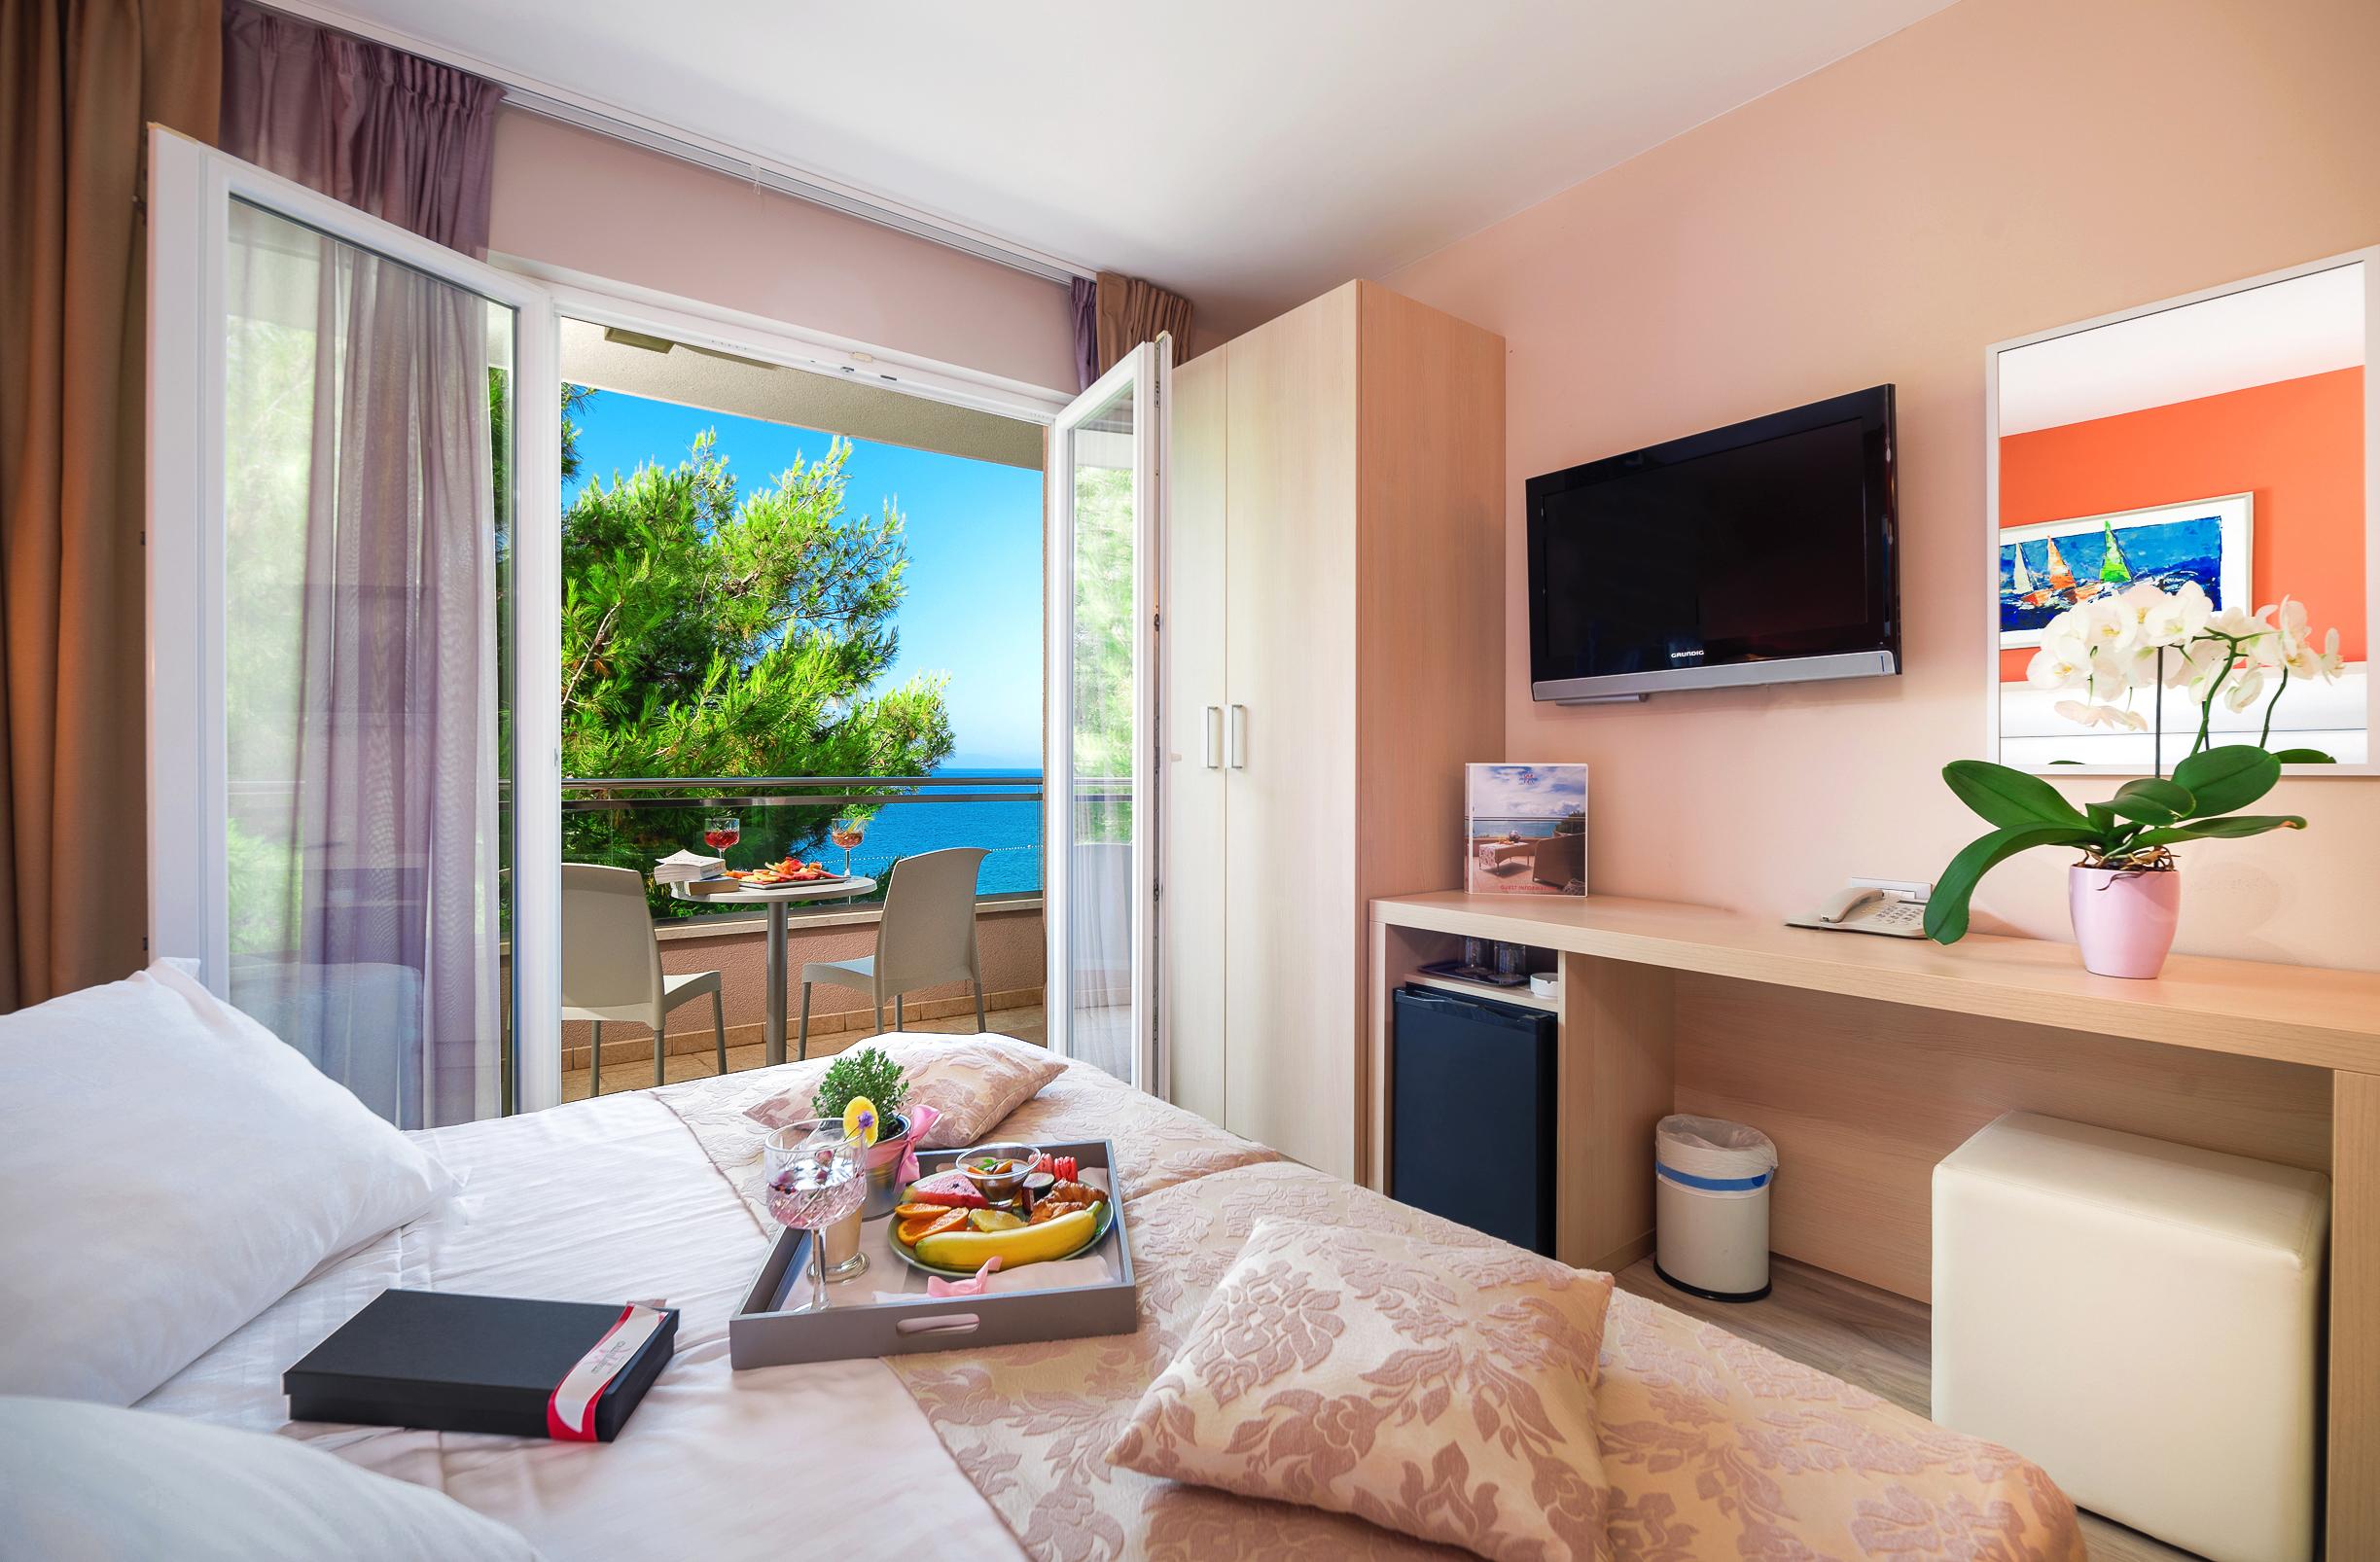 Hotel-Maritimo-Soba-2-1-of-14